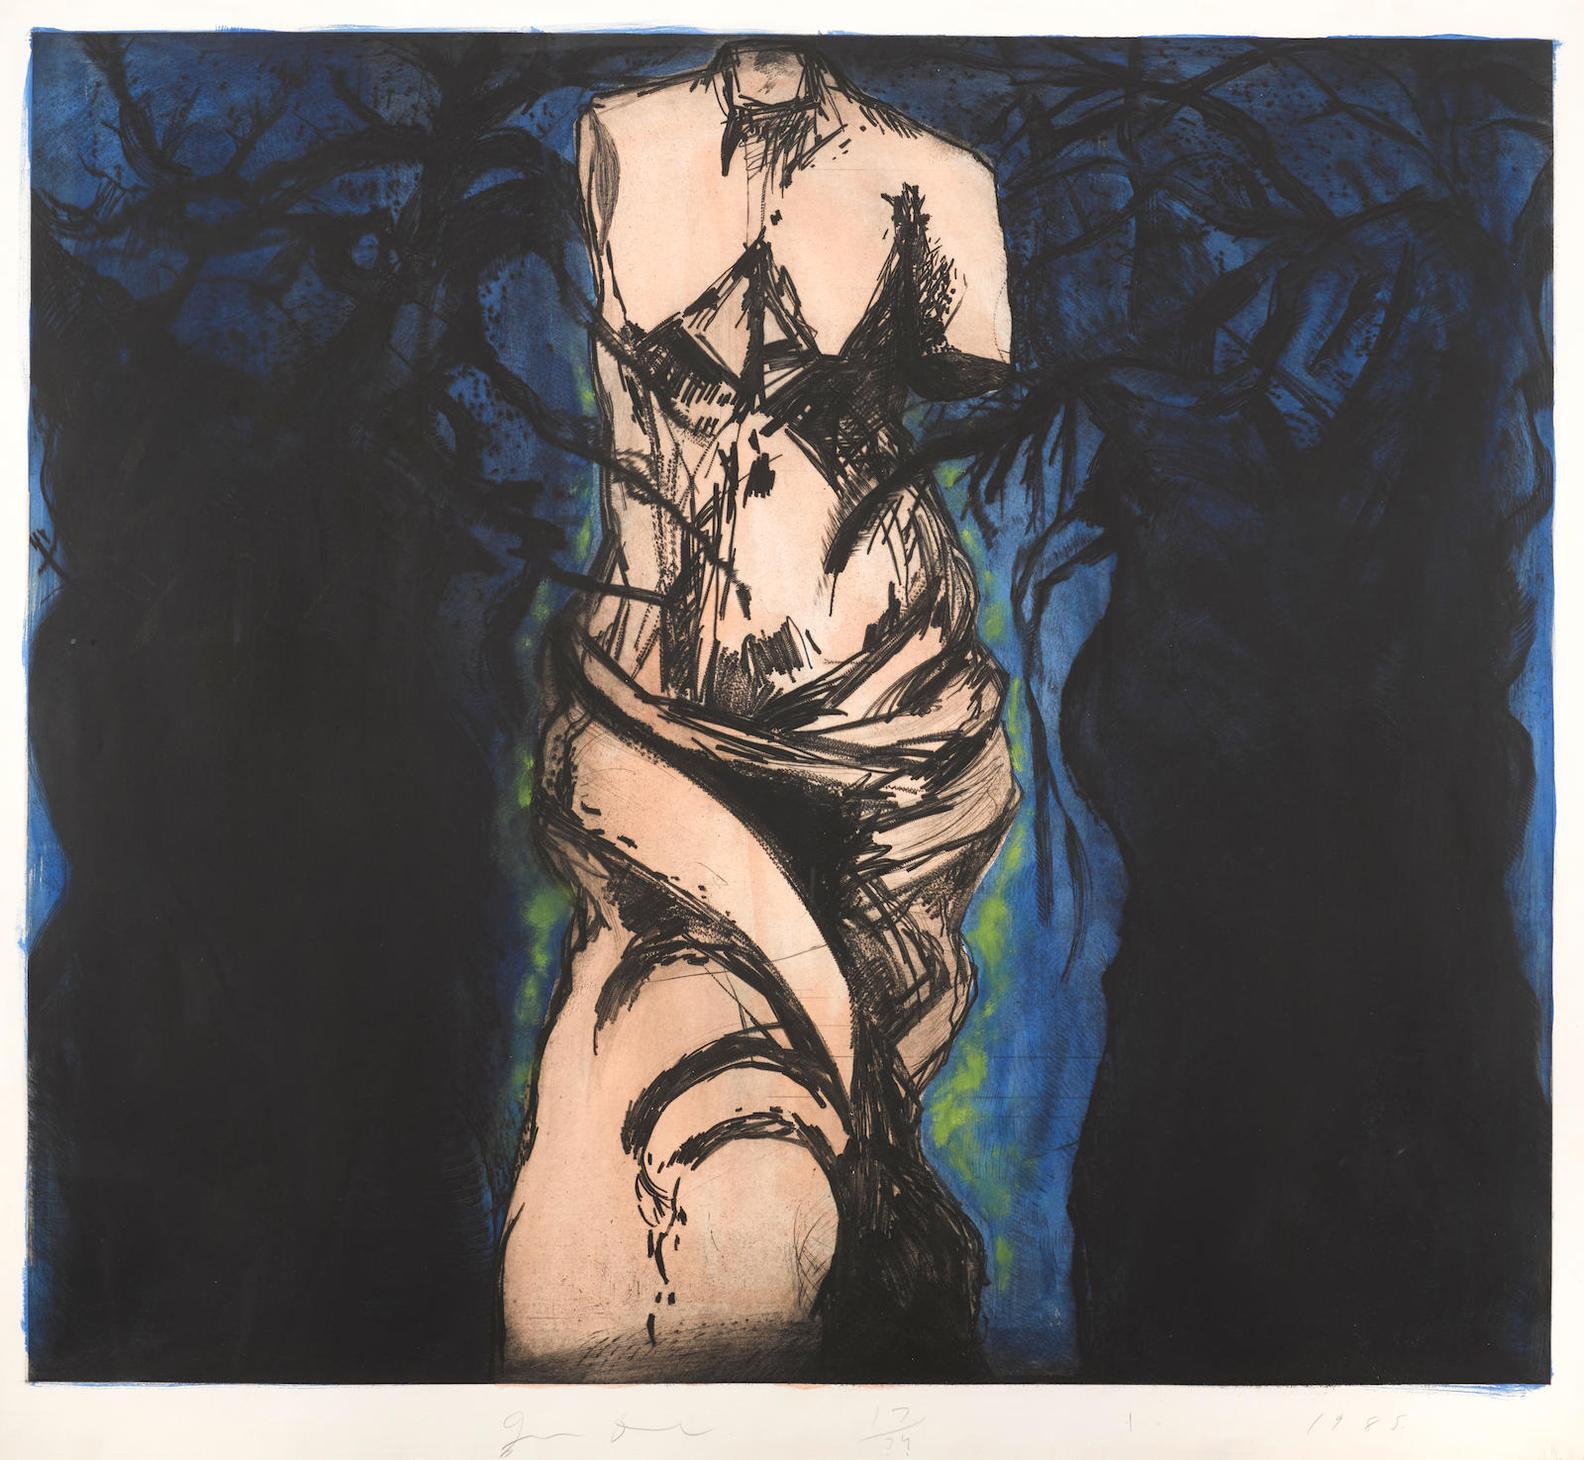 Jim Dine-Rise Up, Solitude!-1985